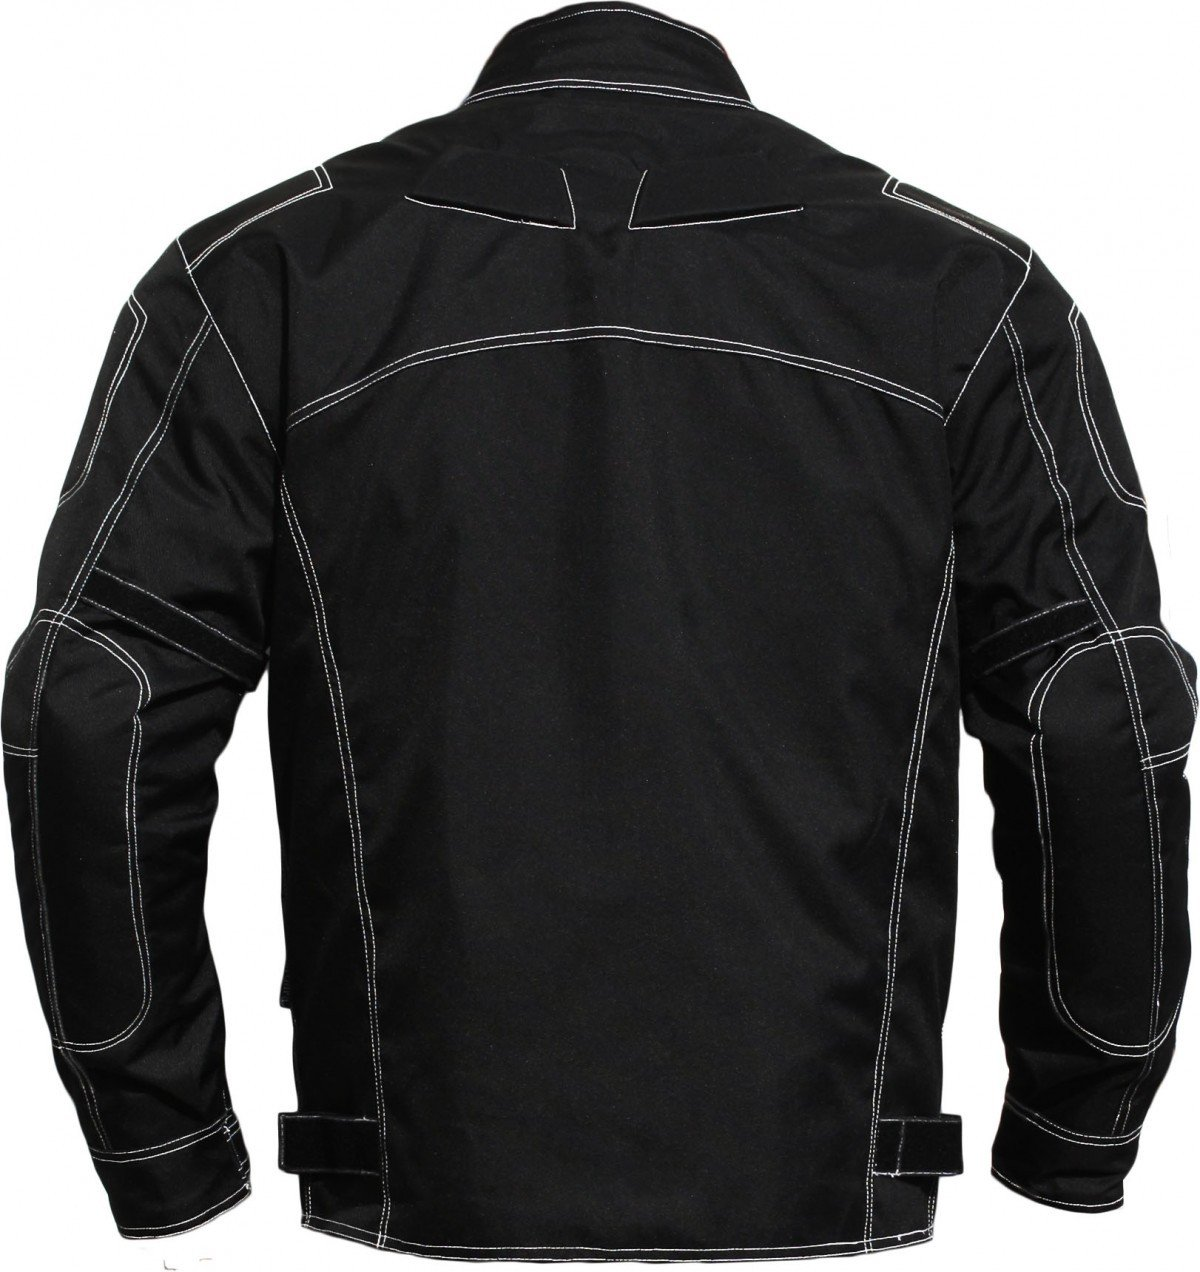 Schwarz 56 German Wear Motorradjacke aus Textilien